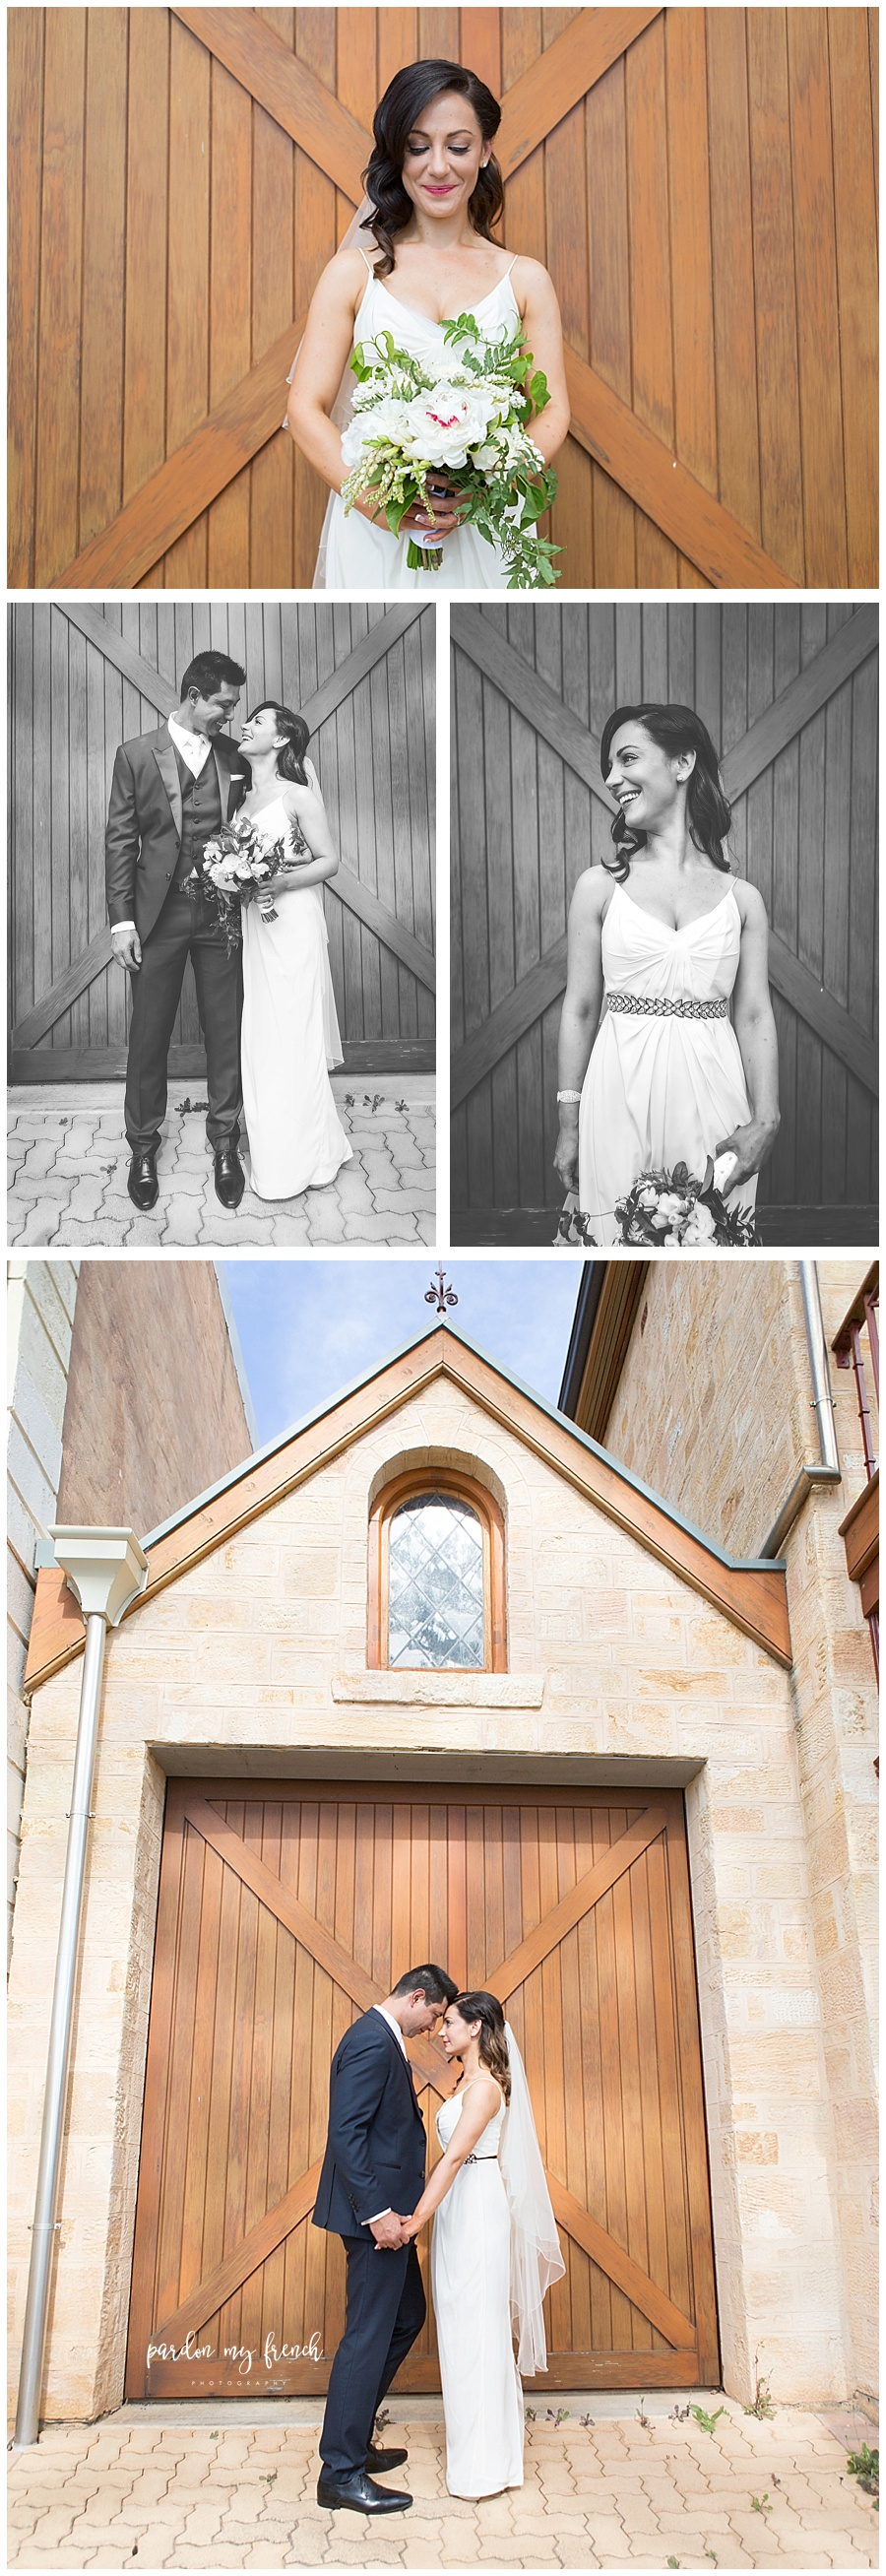 Adelaide Wedding Photographer 64.jpg